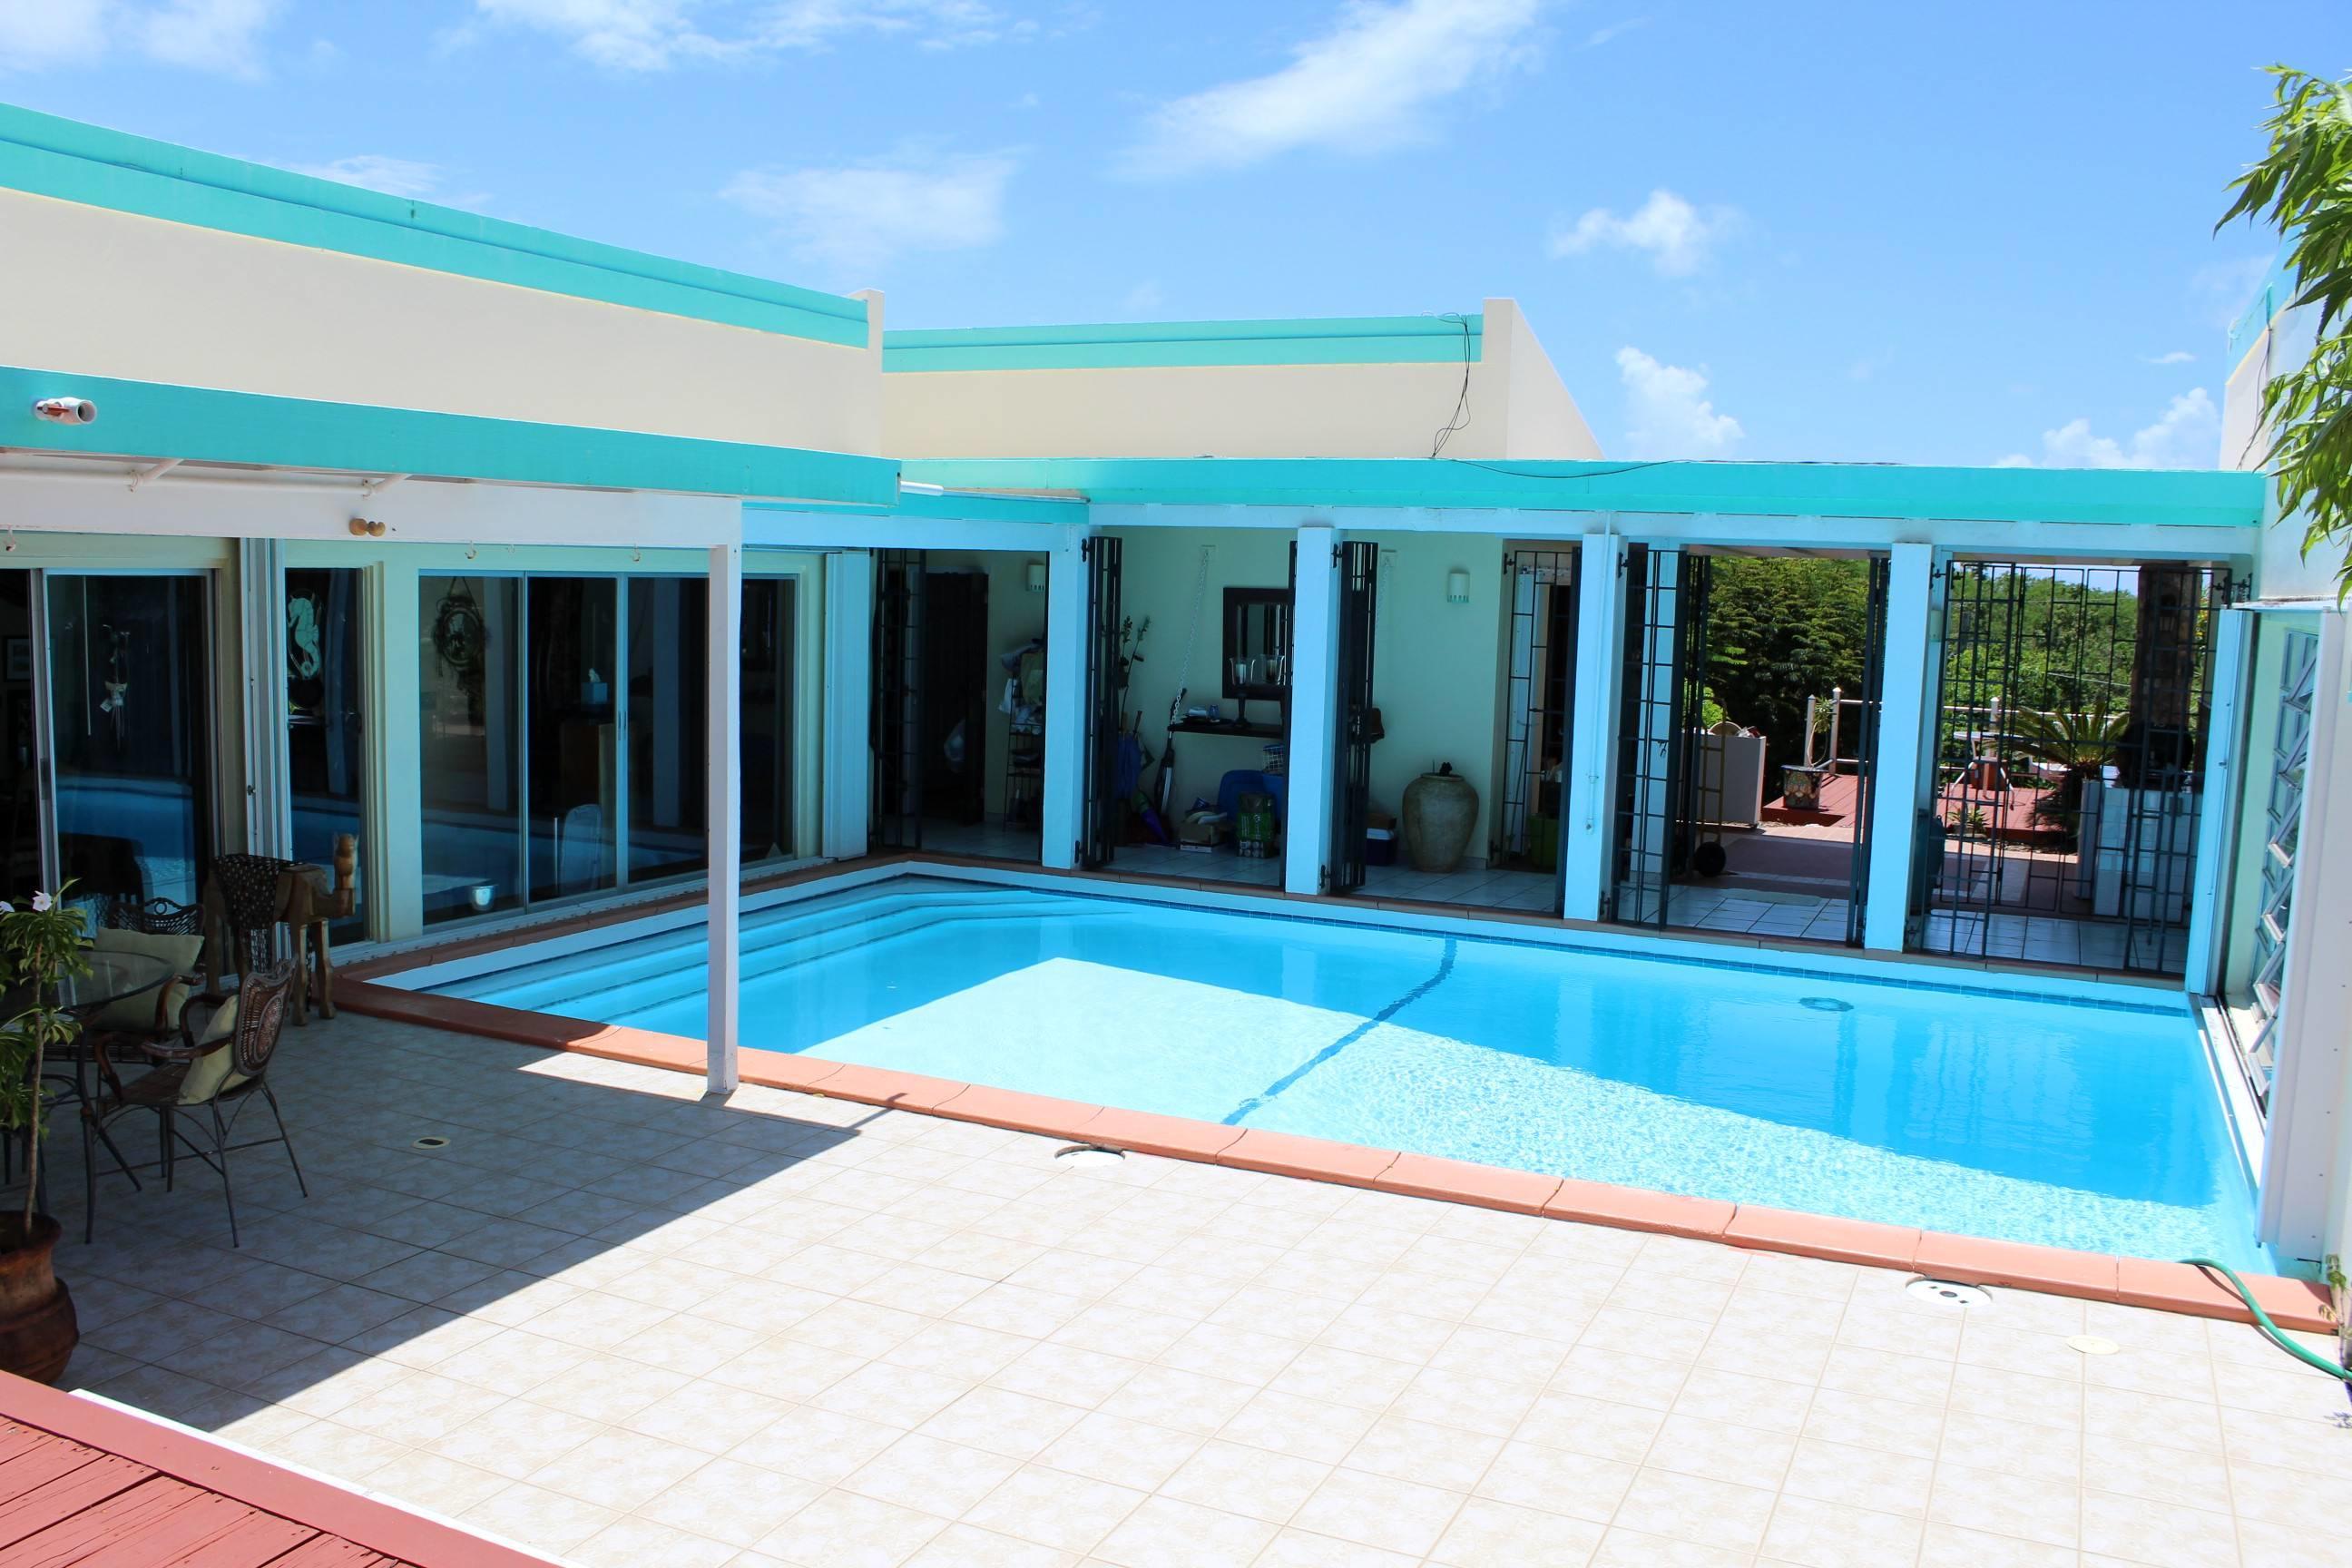 Single Family Home for Sale at 26 & 26A Marienhoj EA 26 & 26A Marienhoj EA St Croix, Virgin Islands 00820 United States Virgin Islands